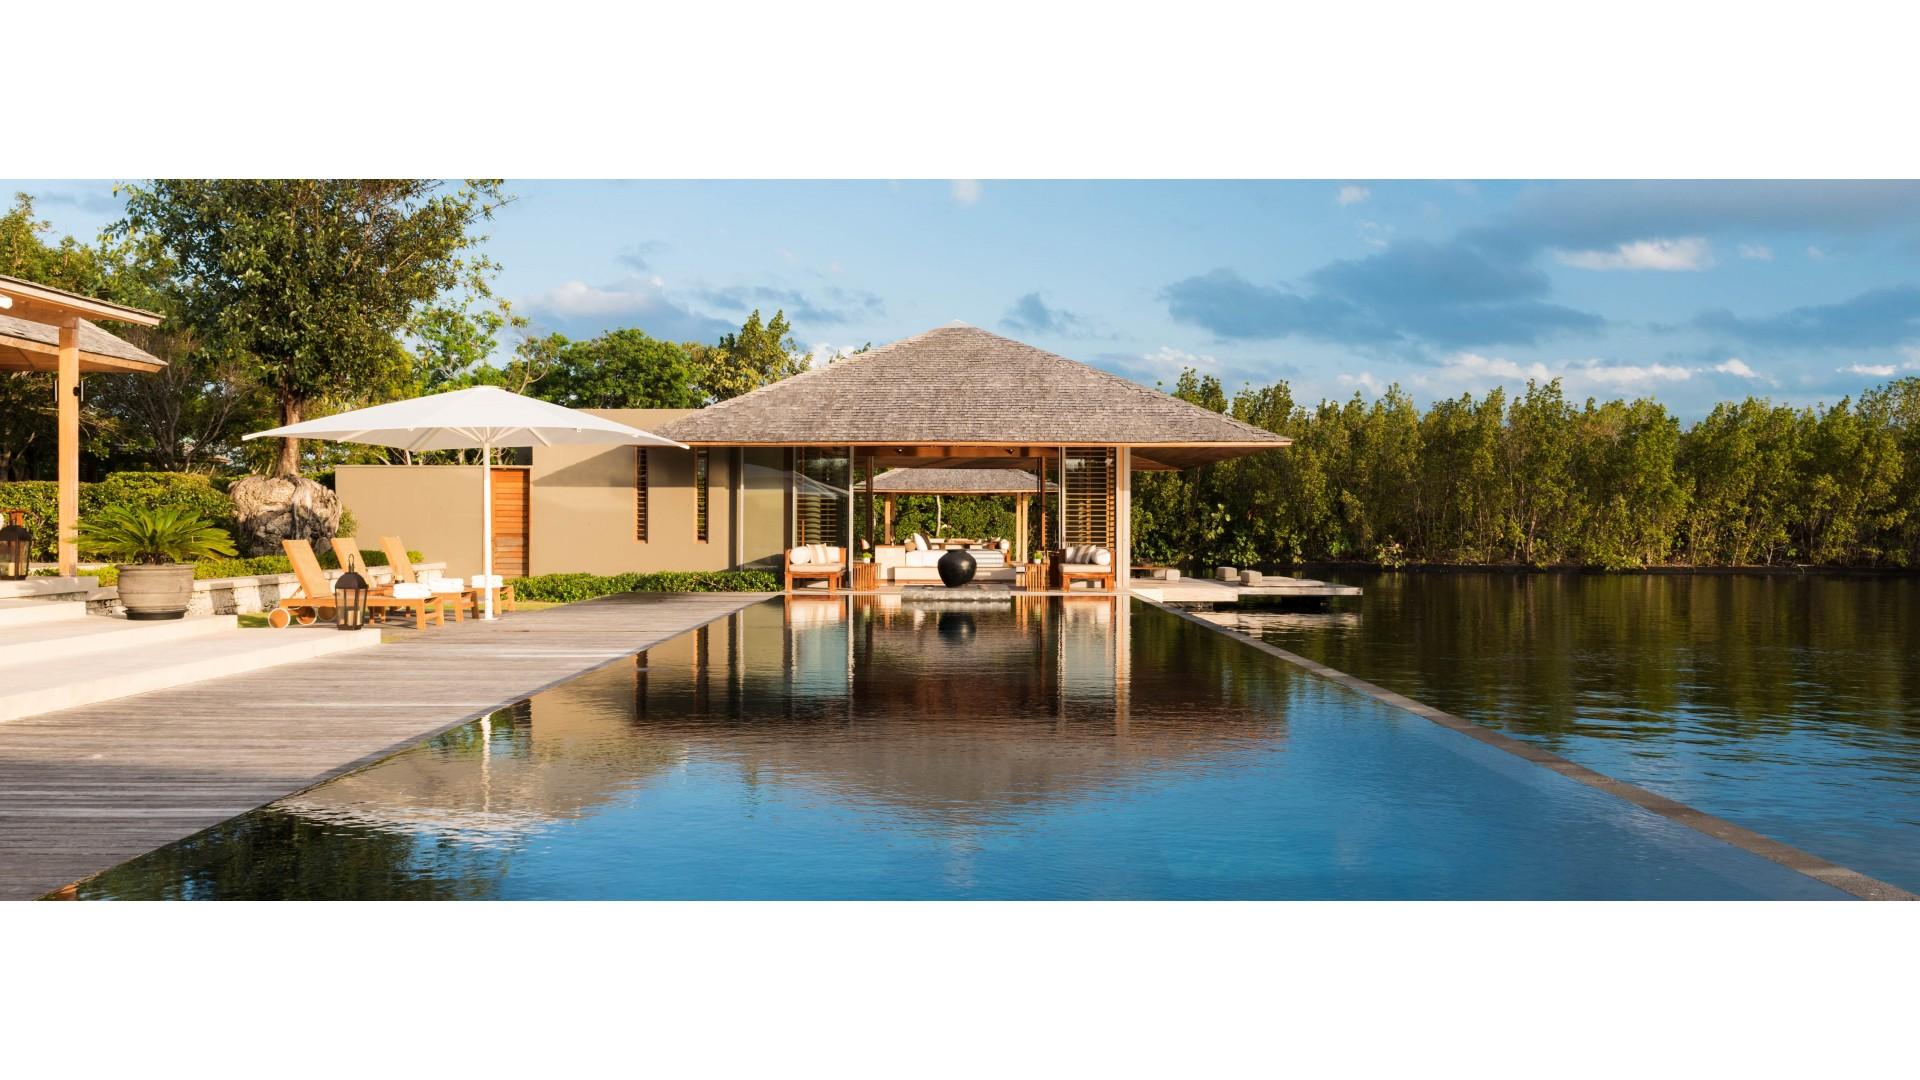 Amanyara hotel - Turks & Caicos - Smith Hotels